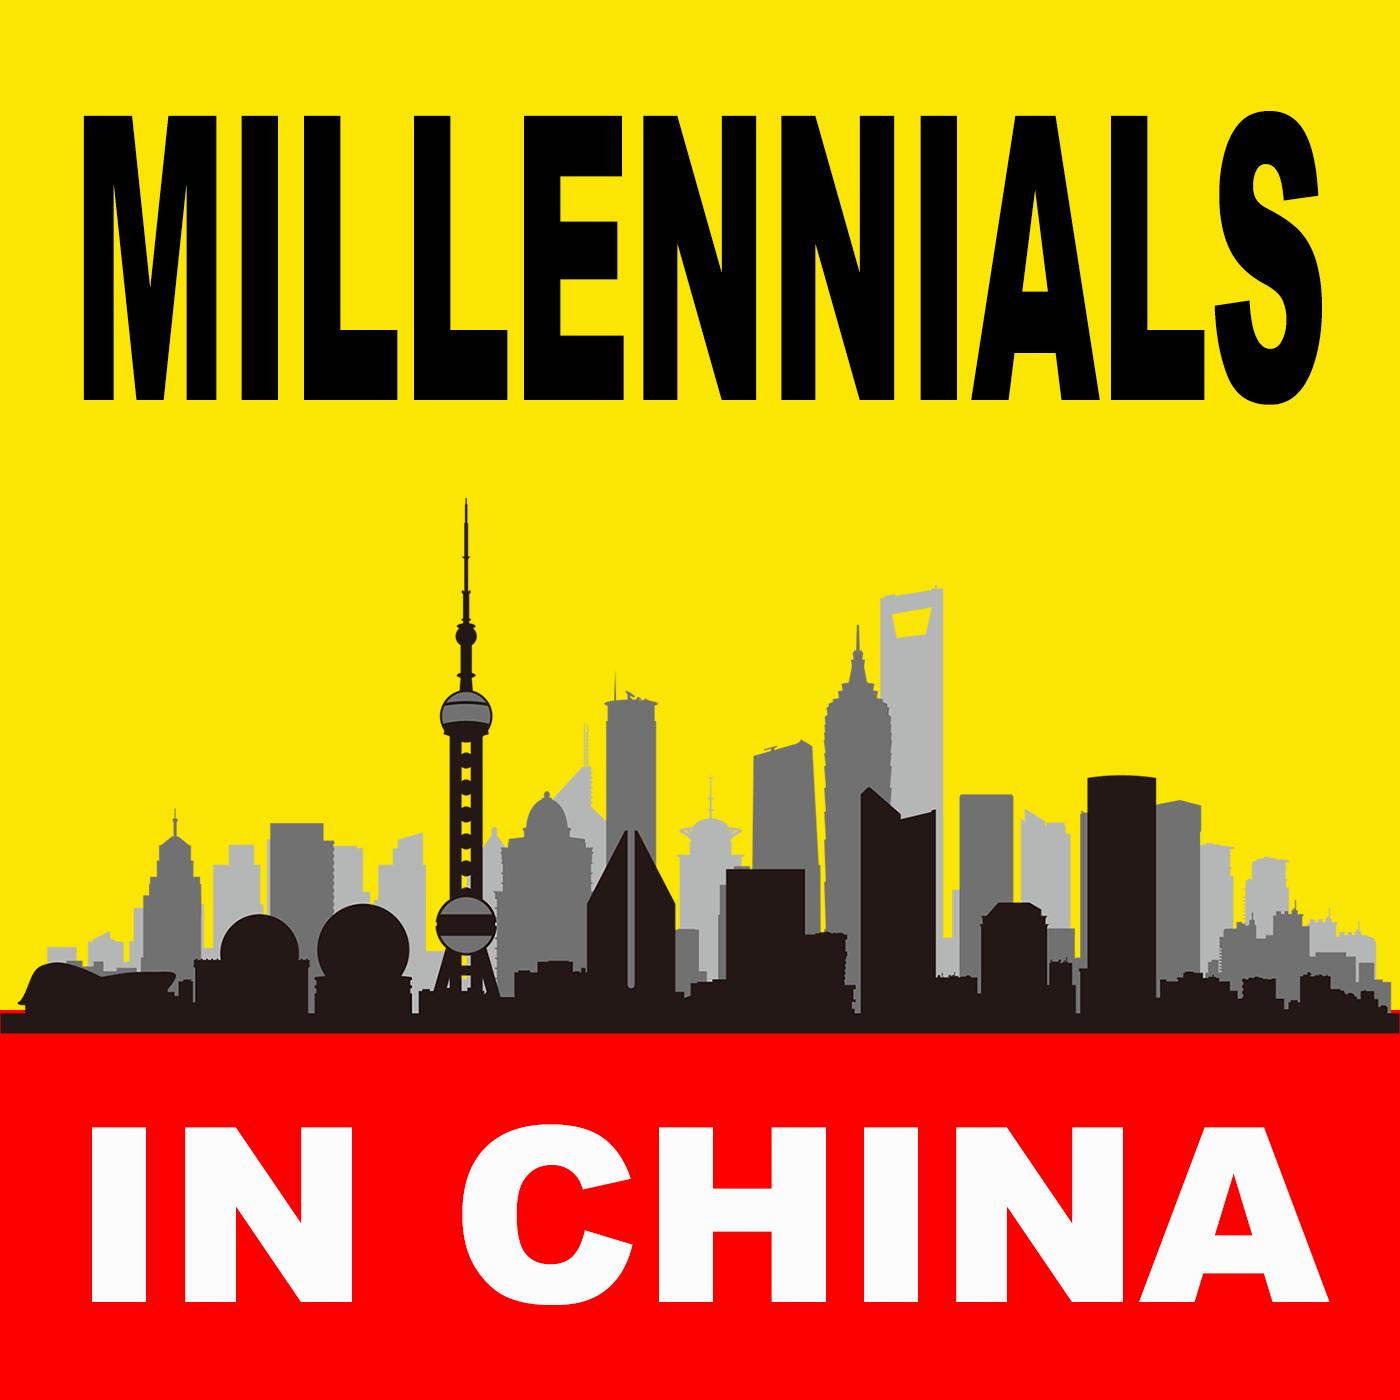 EP12: Entrepreneurship and Surviving Tough Times ft. Victor Lee